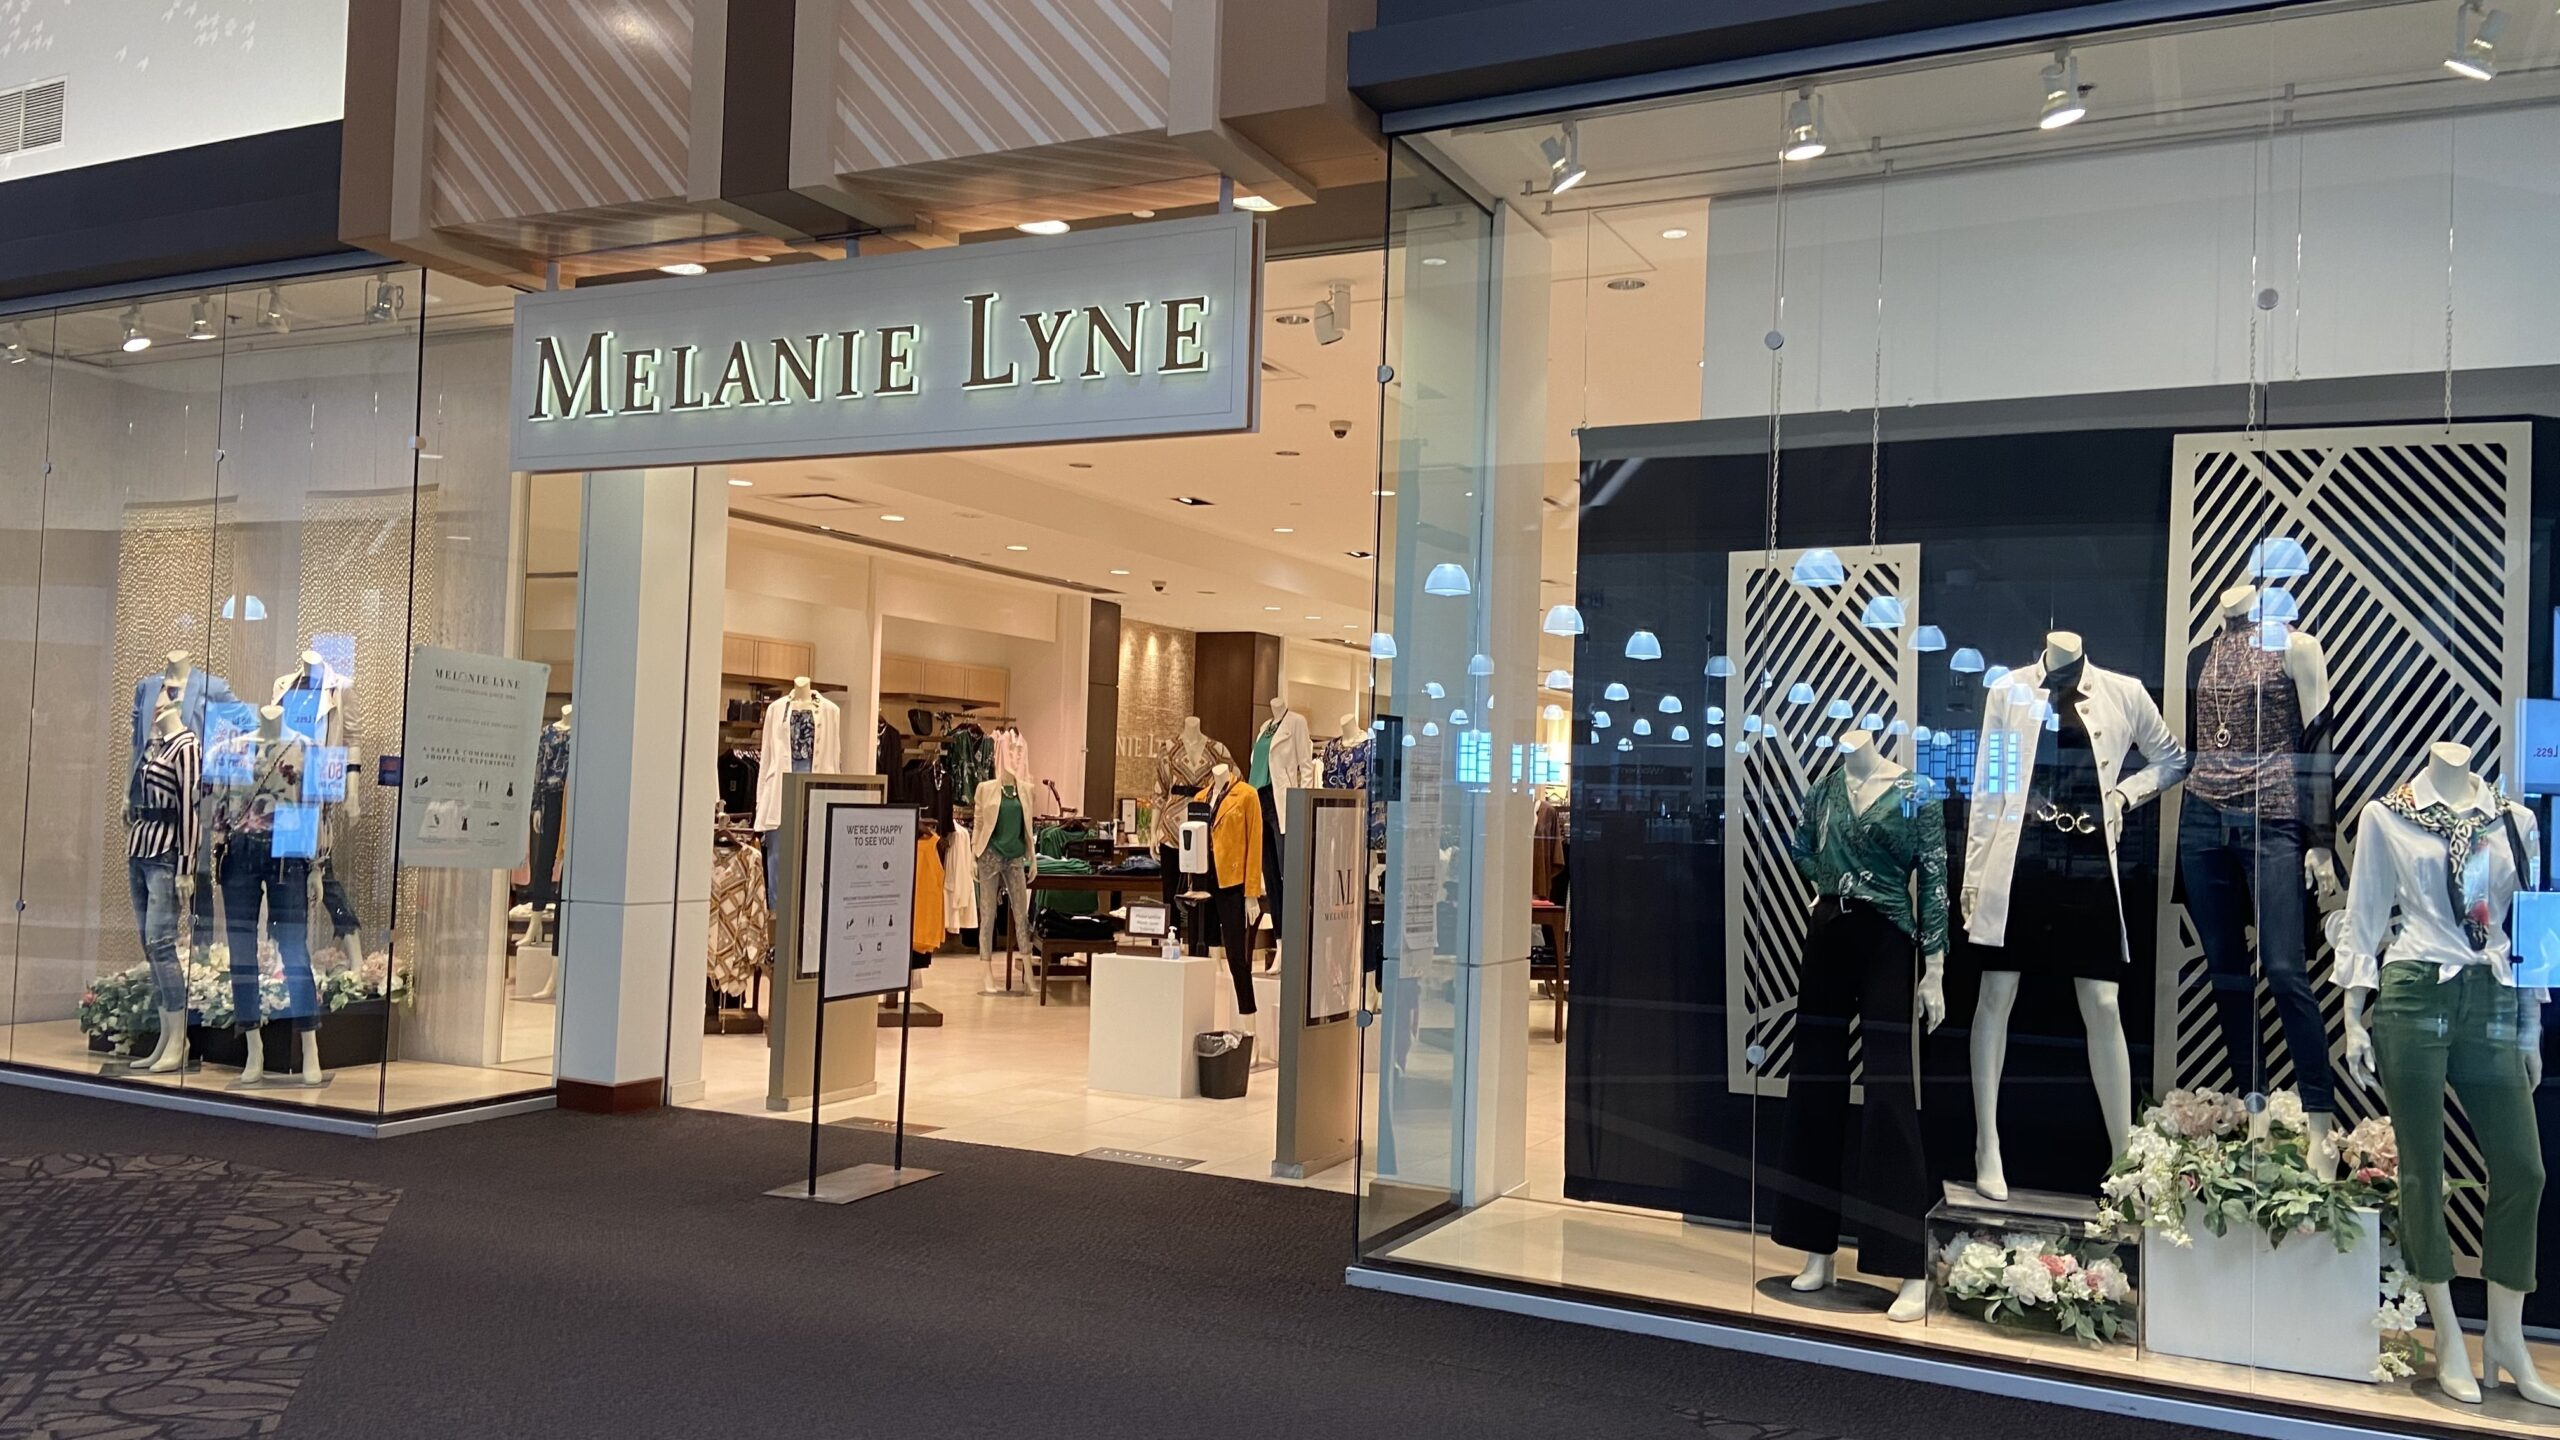 Melanie Lyne at CrossIron Mills